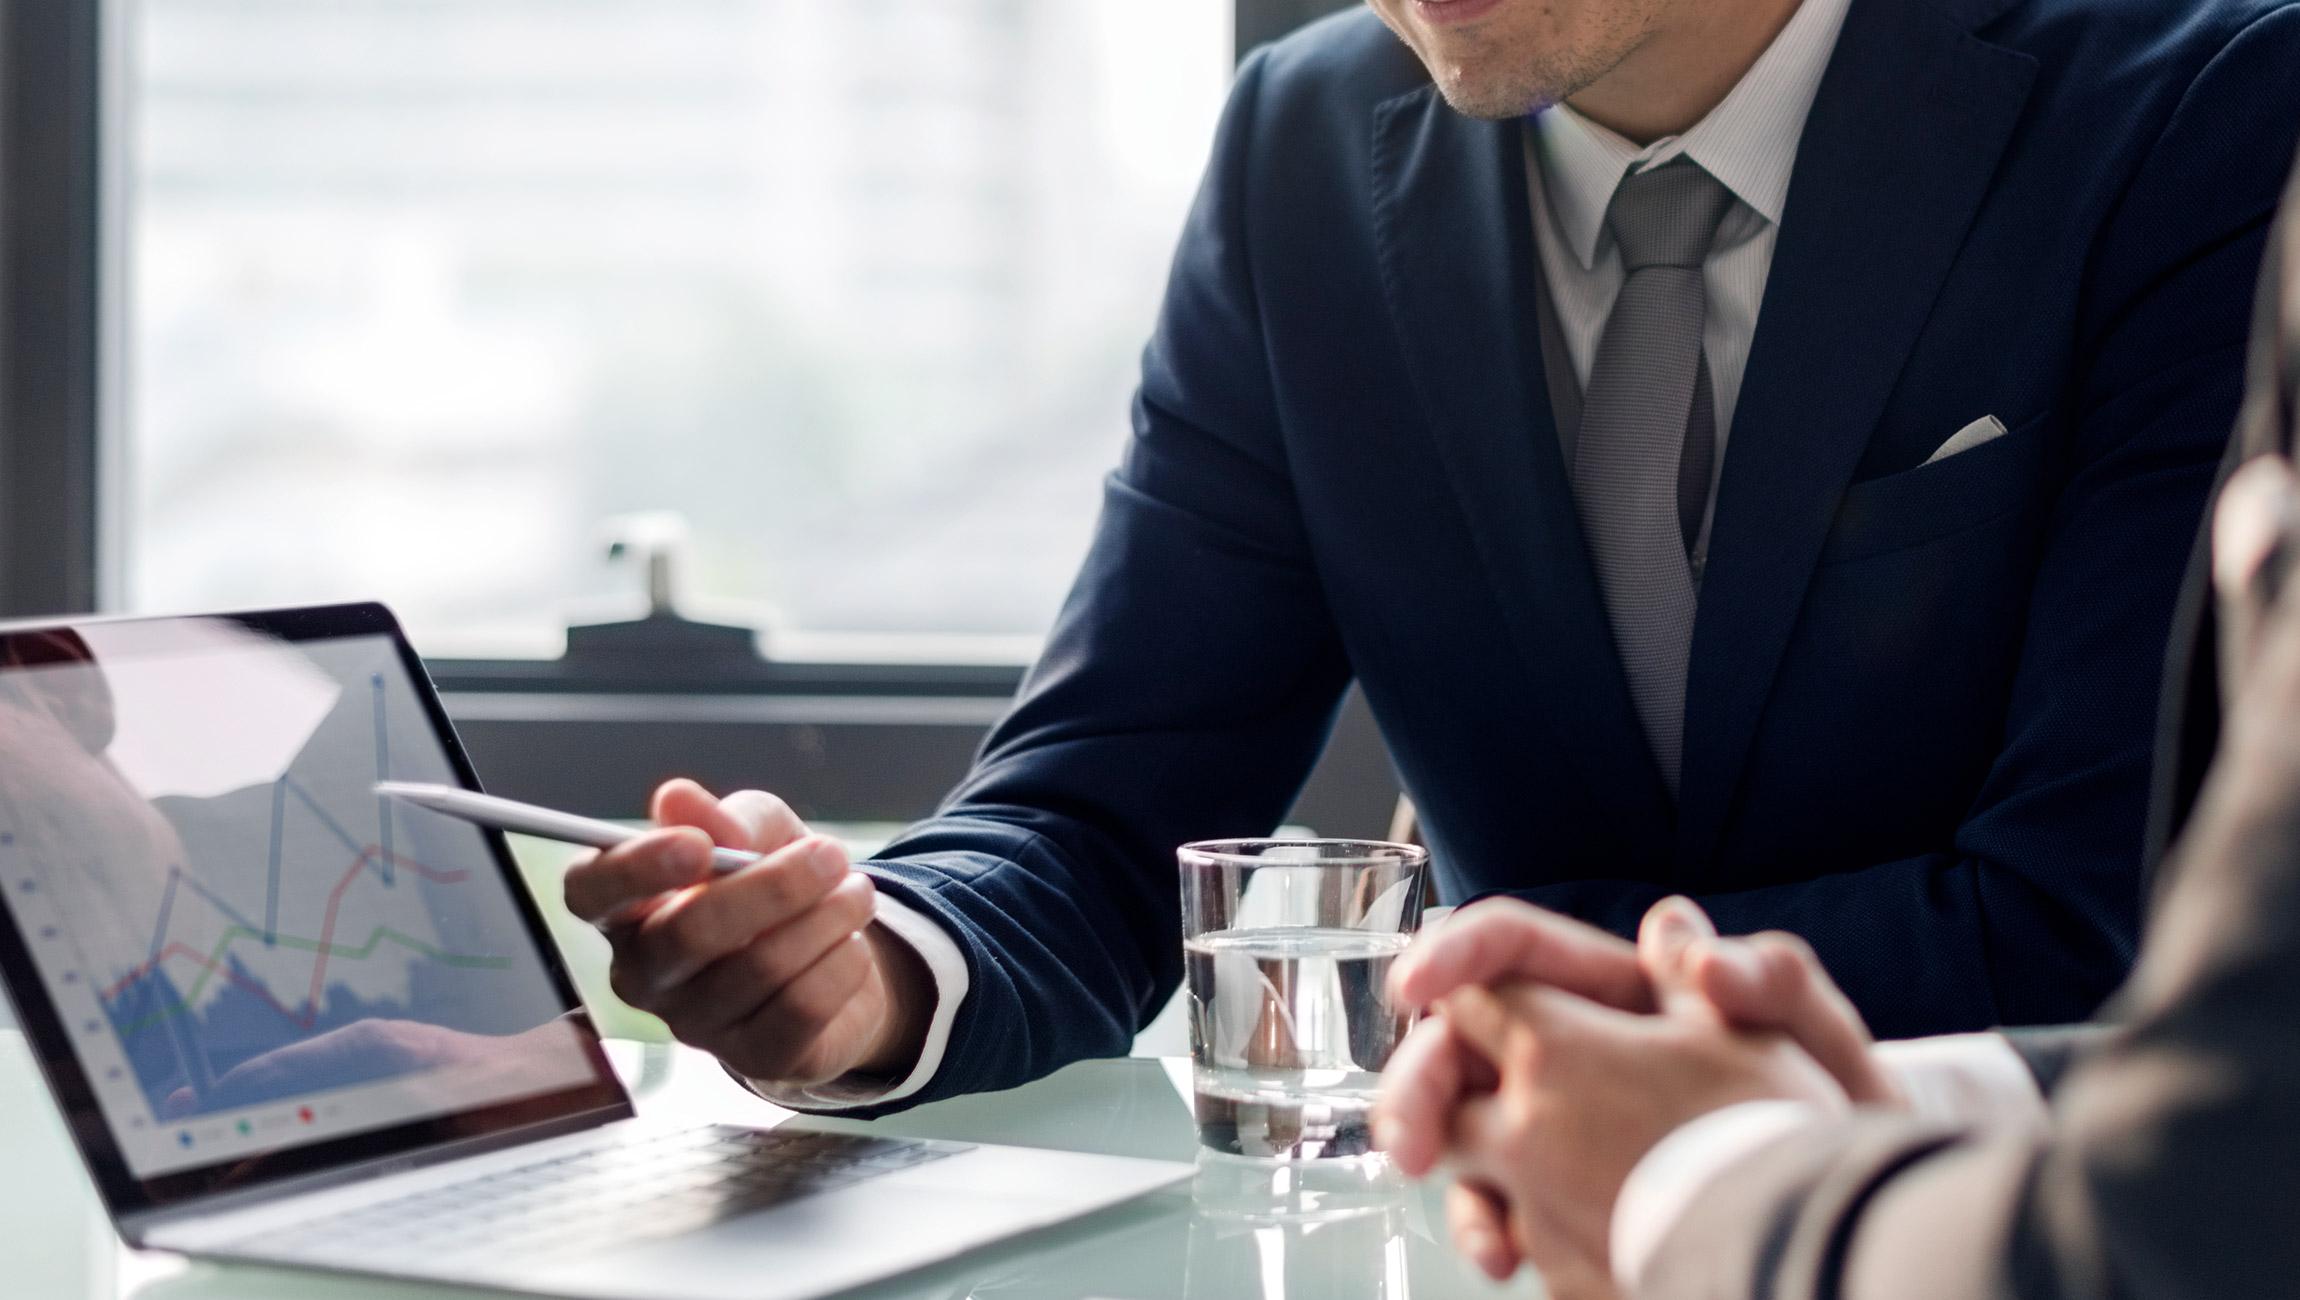 Enterprises Across the Globe Look to Improve Customer Experience